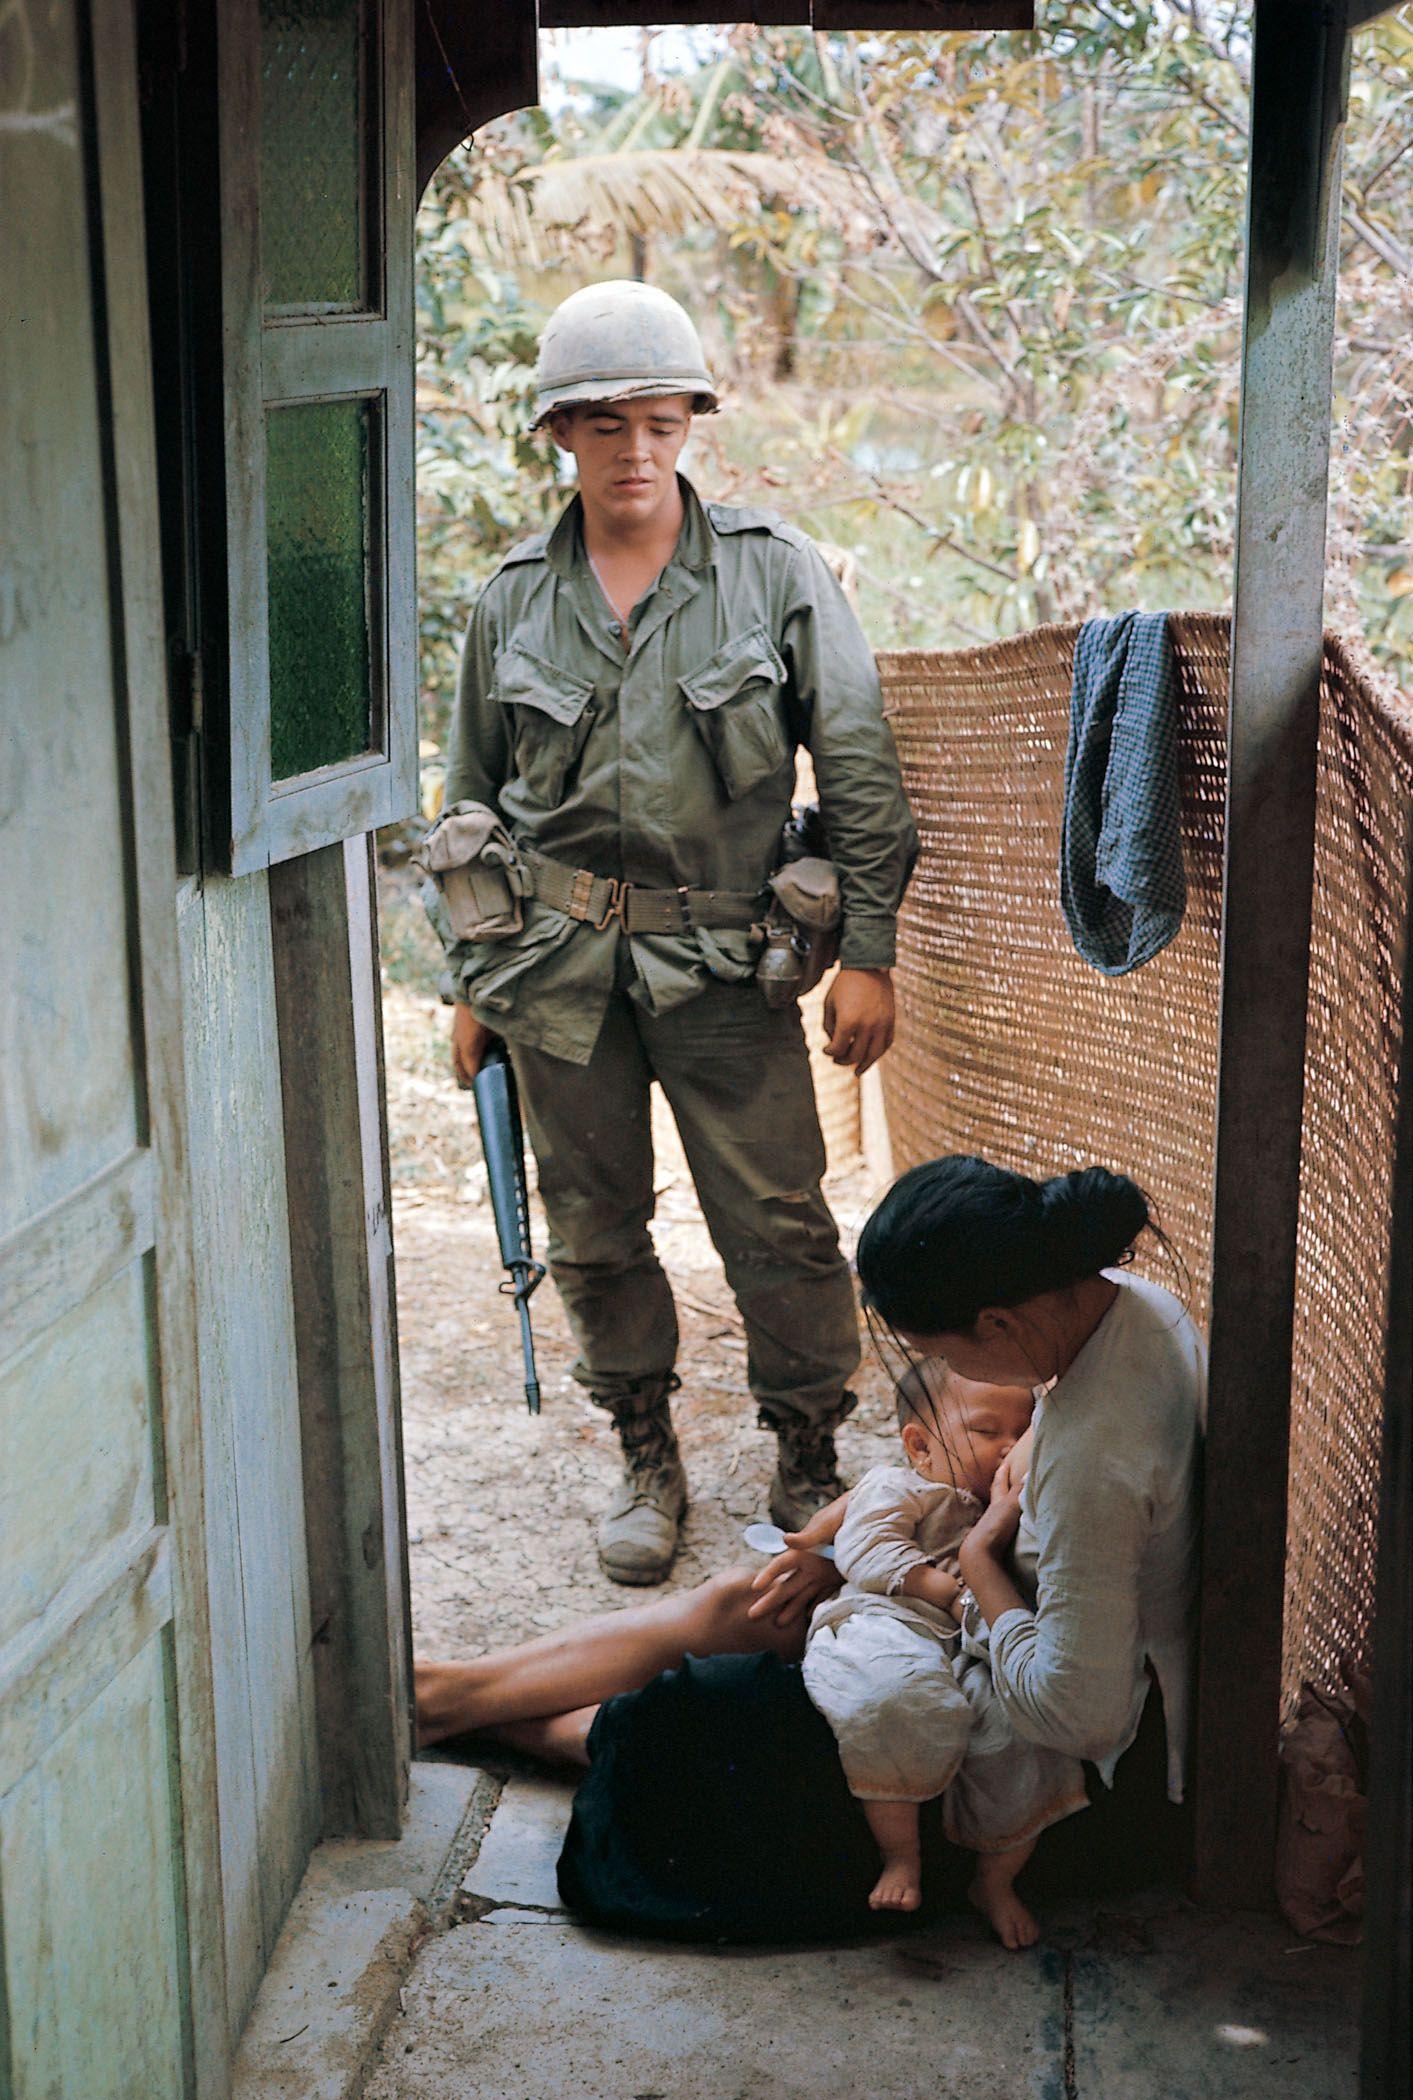 milk vet Breast selling vietnam